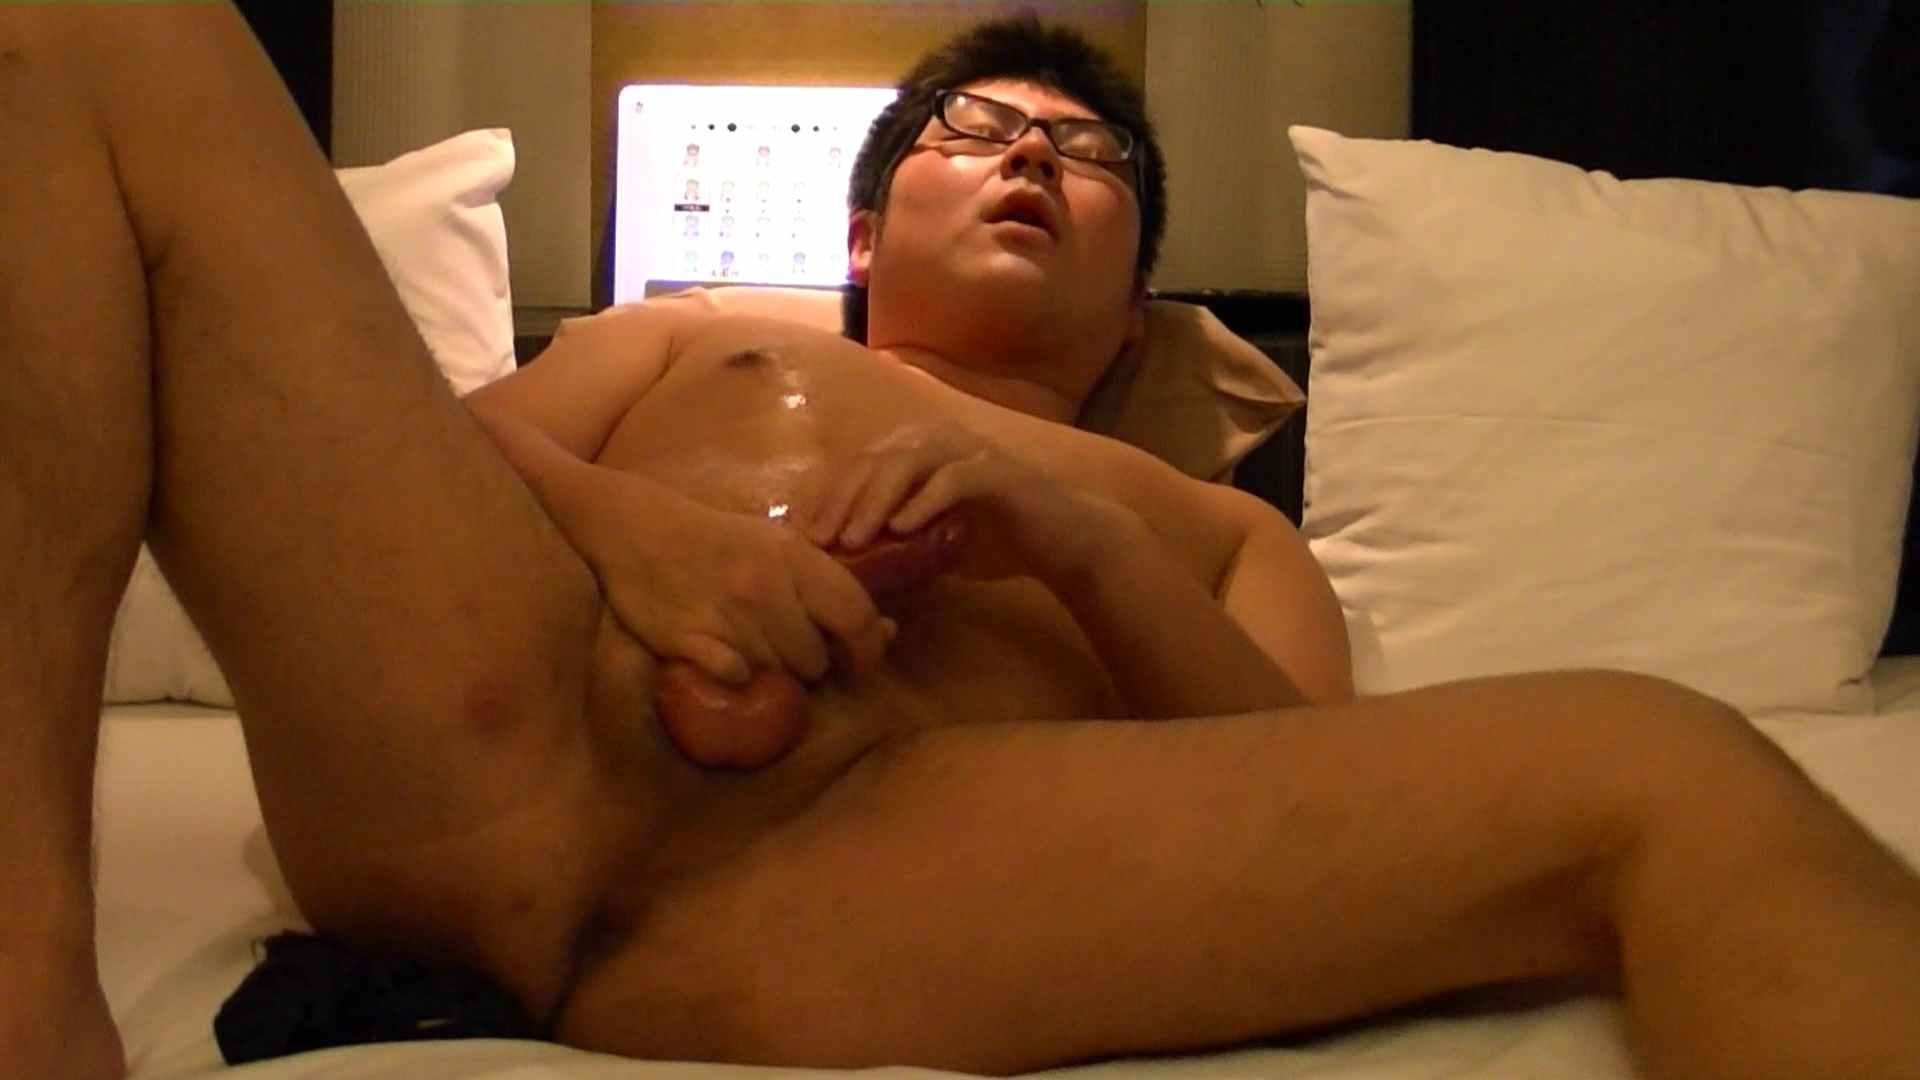 Mr.オナックスさん投稿!HD 貴方のオナニー三万円で撮影させてください。VOL.03 後編 完全無修正でお届け | オナニー特集  83pic 60